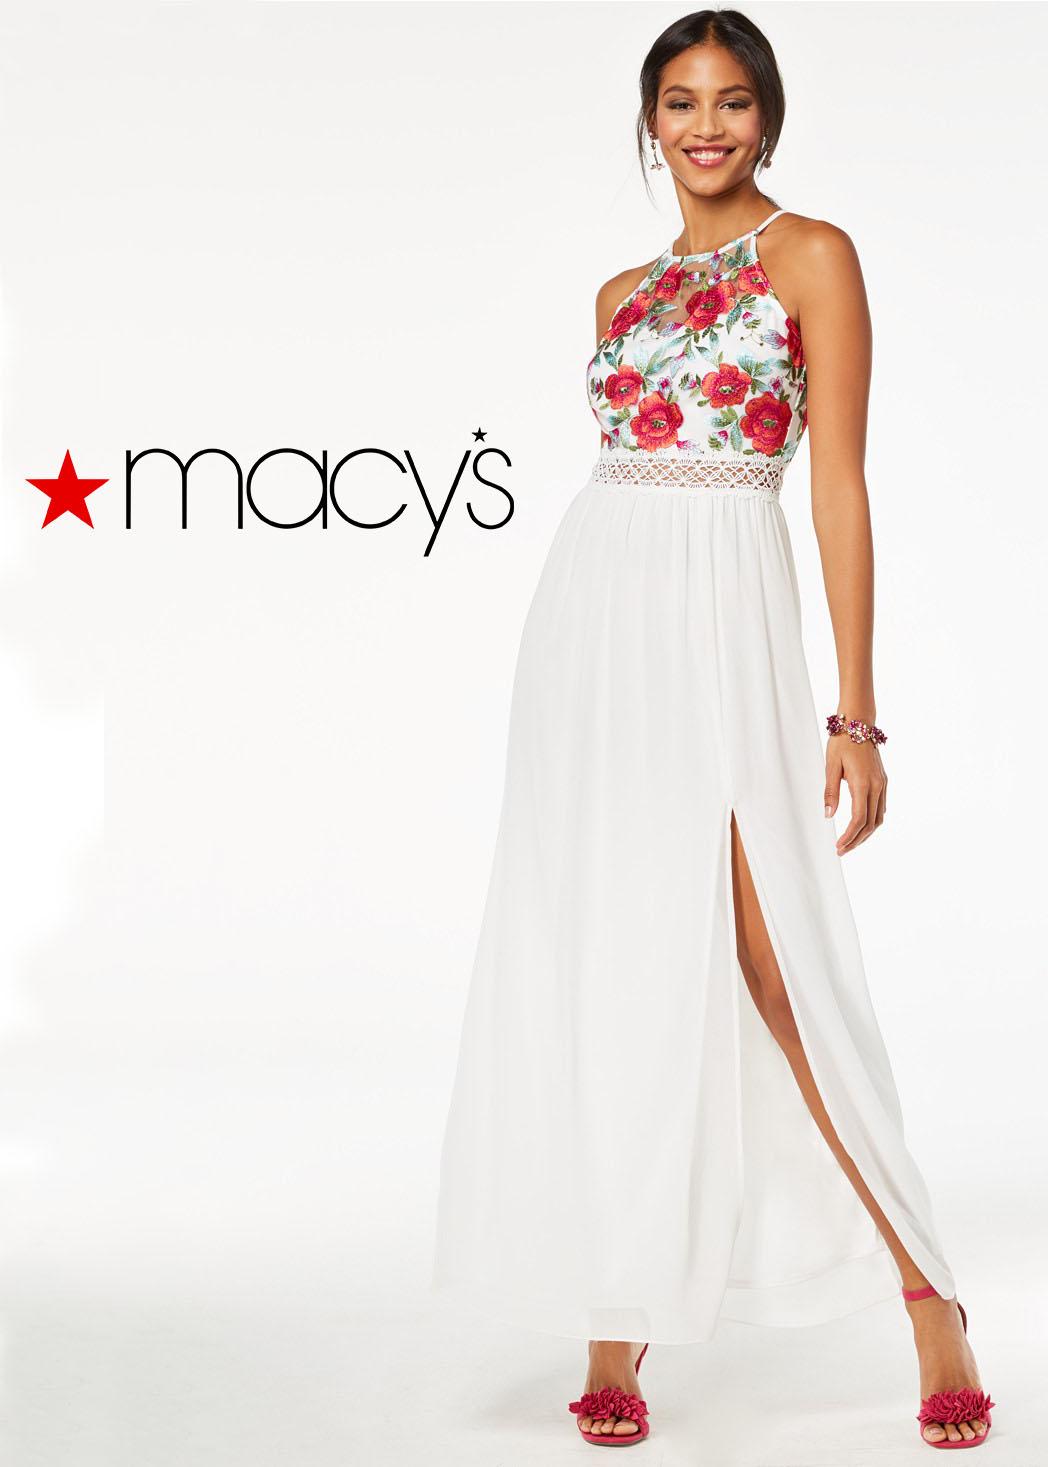 Macys Prom dresses 2021